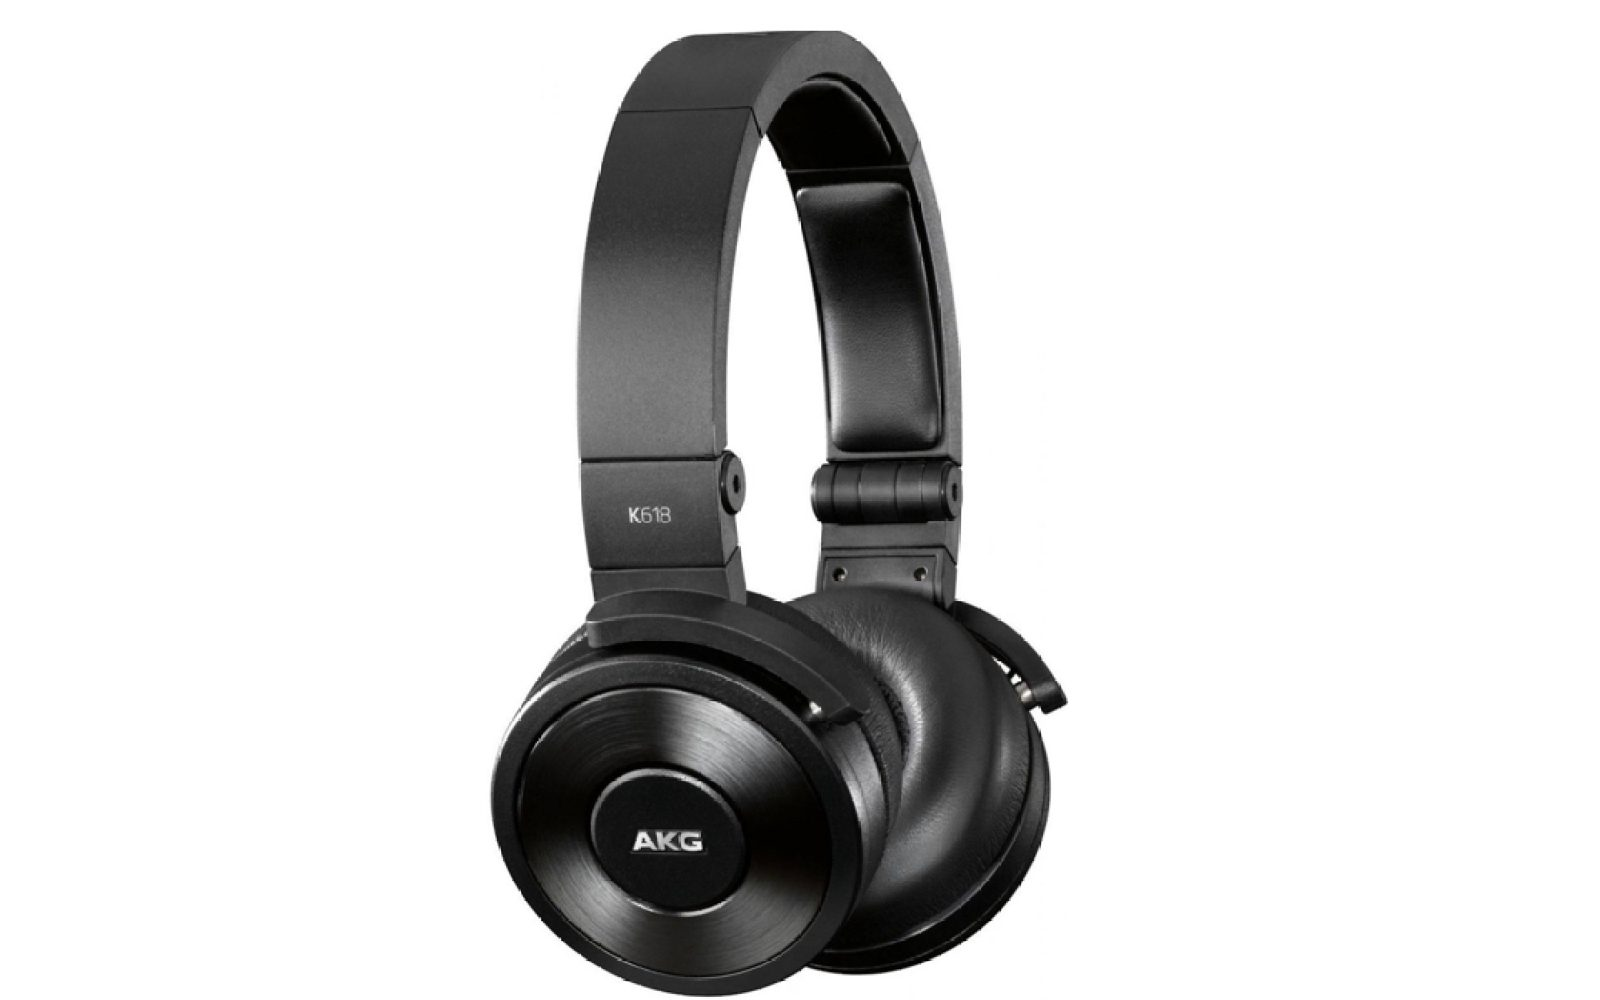 da0aab56ef6 Harman Kardon: AKG K618 Pro DJ headphones $40, JBL Xtreme Bluetooth speaker  (Refurb) $210 shipped, more